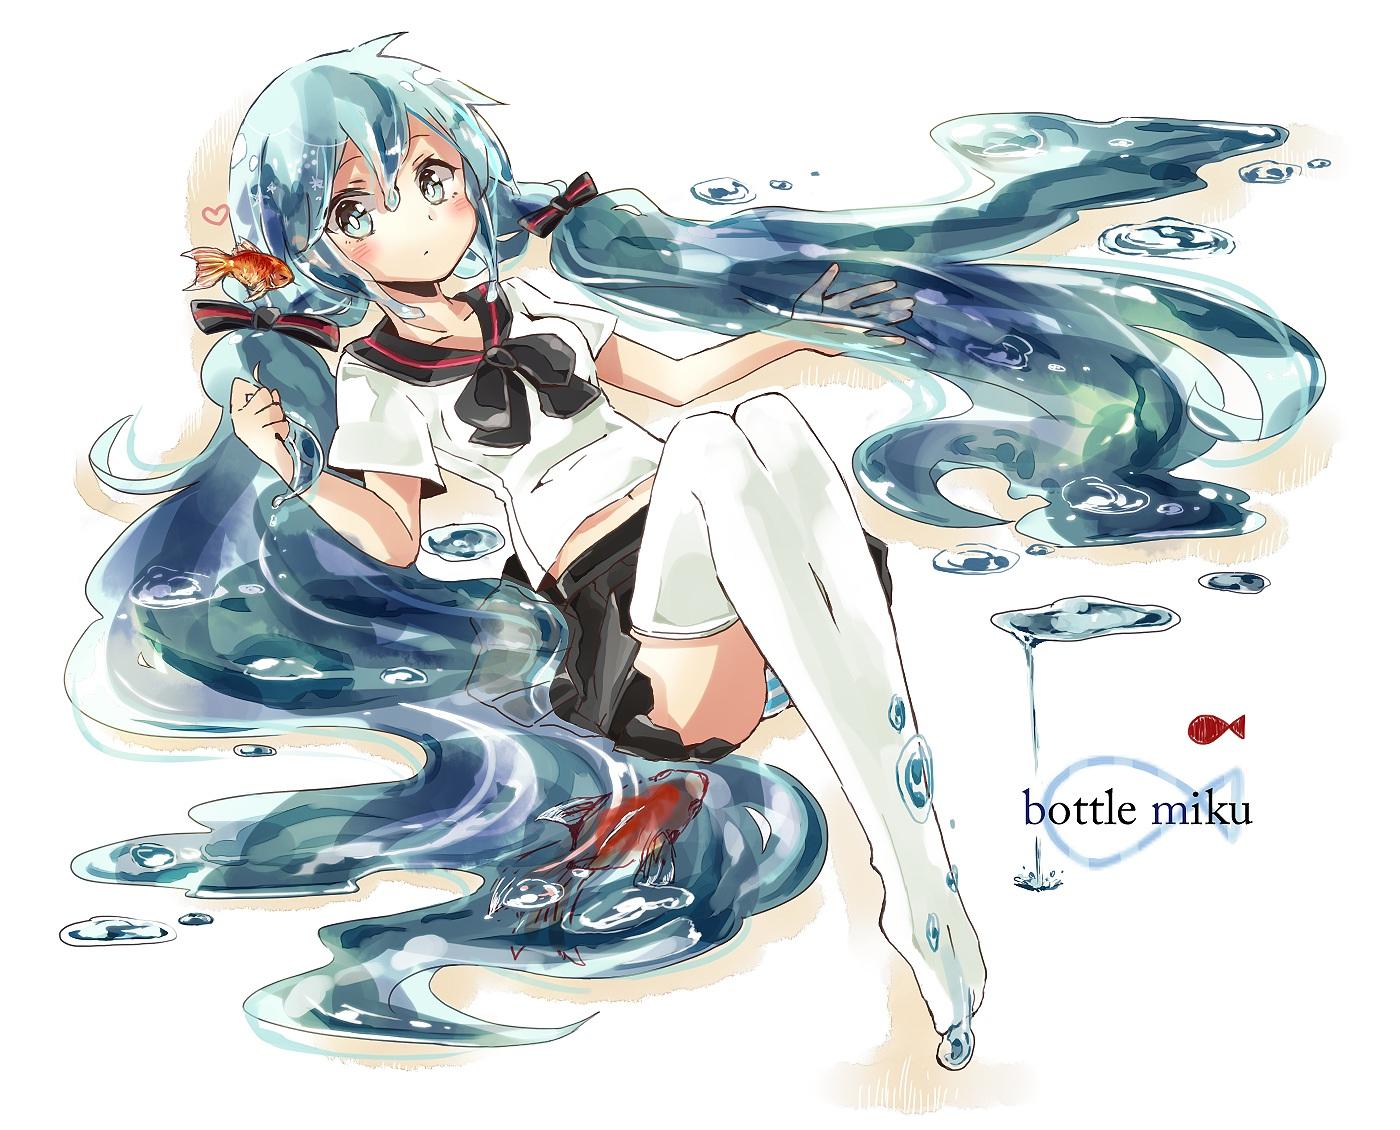 animal blush bottle_miku fish hatsune_miku long_hair panties school_uniform striped_panties thighhighs tsumikisumi twintails underwear vocaloid water